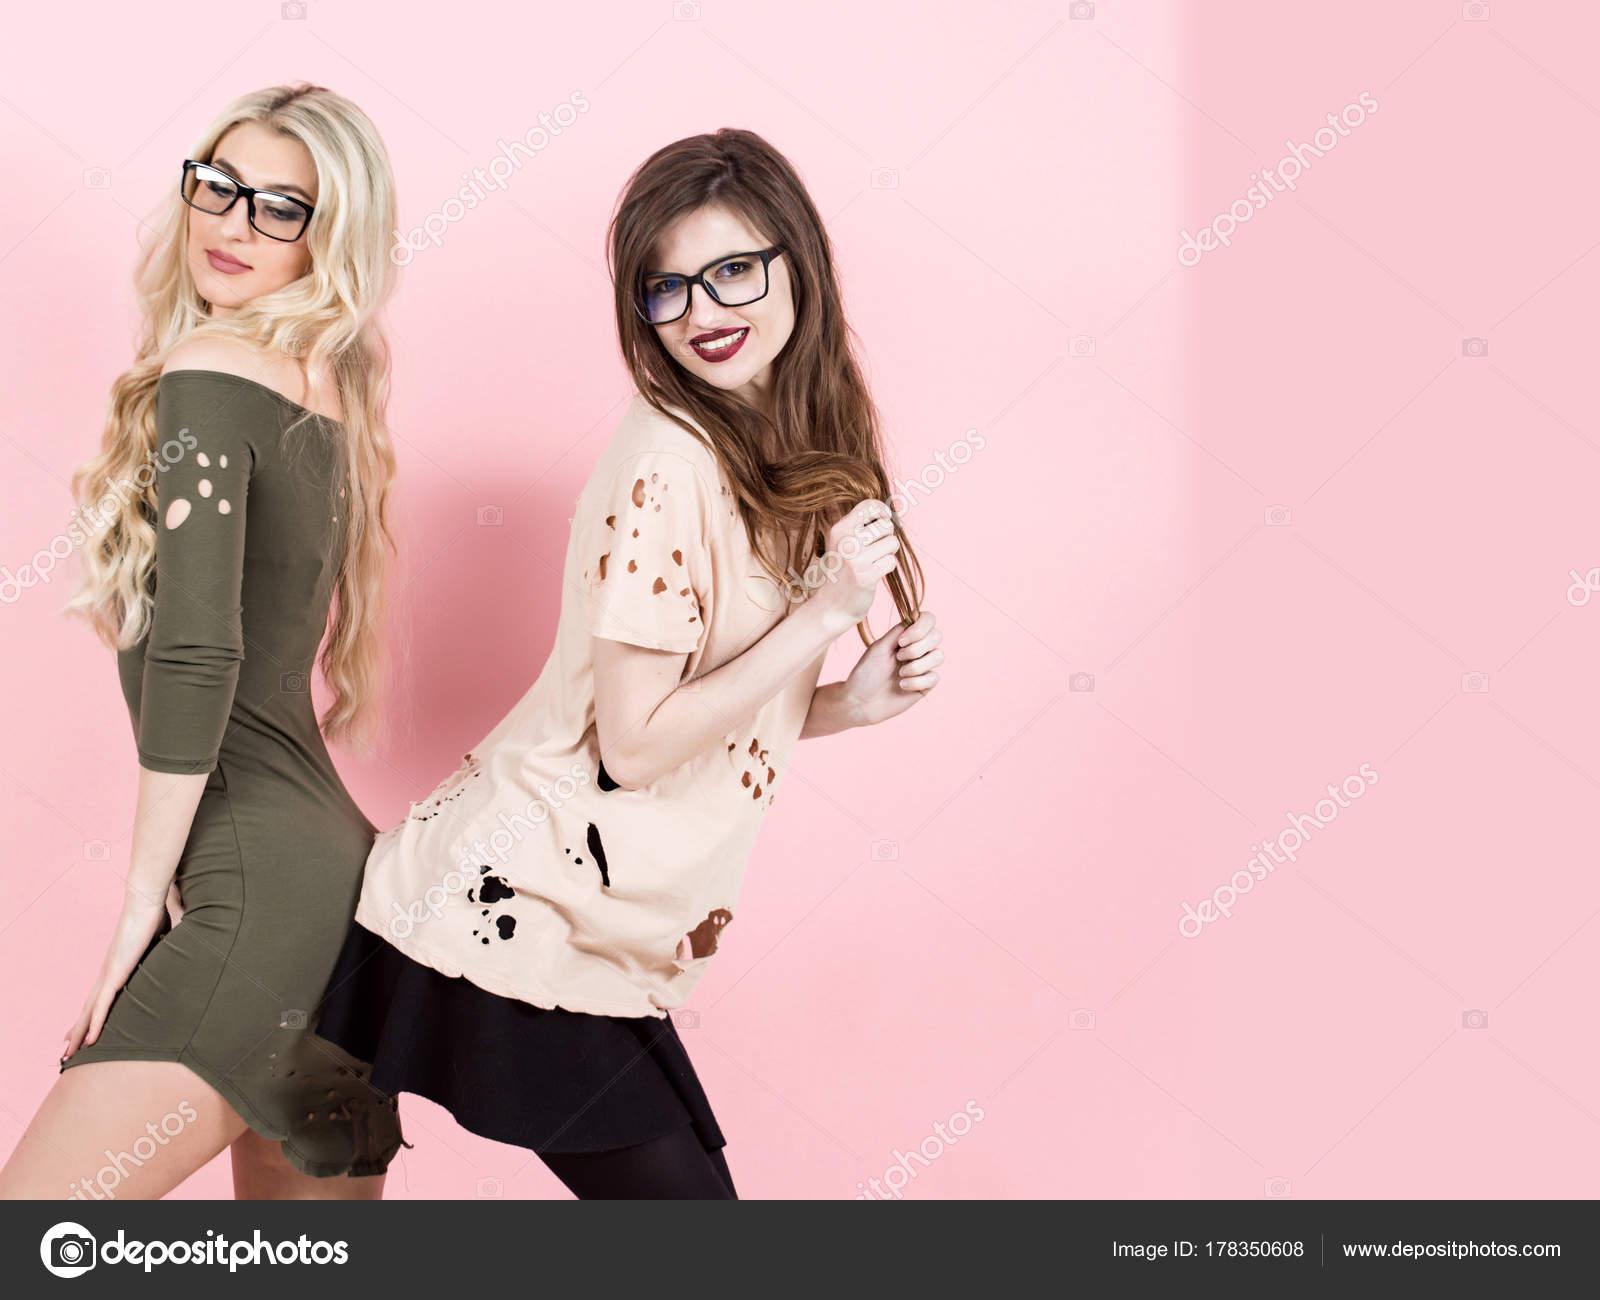 c472786ca9 Γυναίκες με μακριά μαλλιά χαμόγελο με τα geek γυαλιά — Φωτογραφία Αρχείου